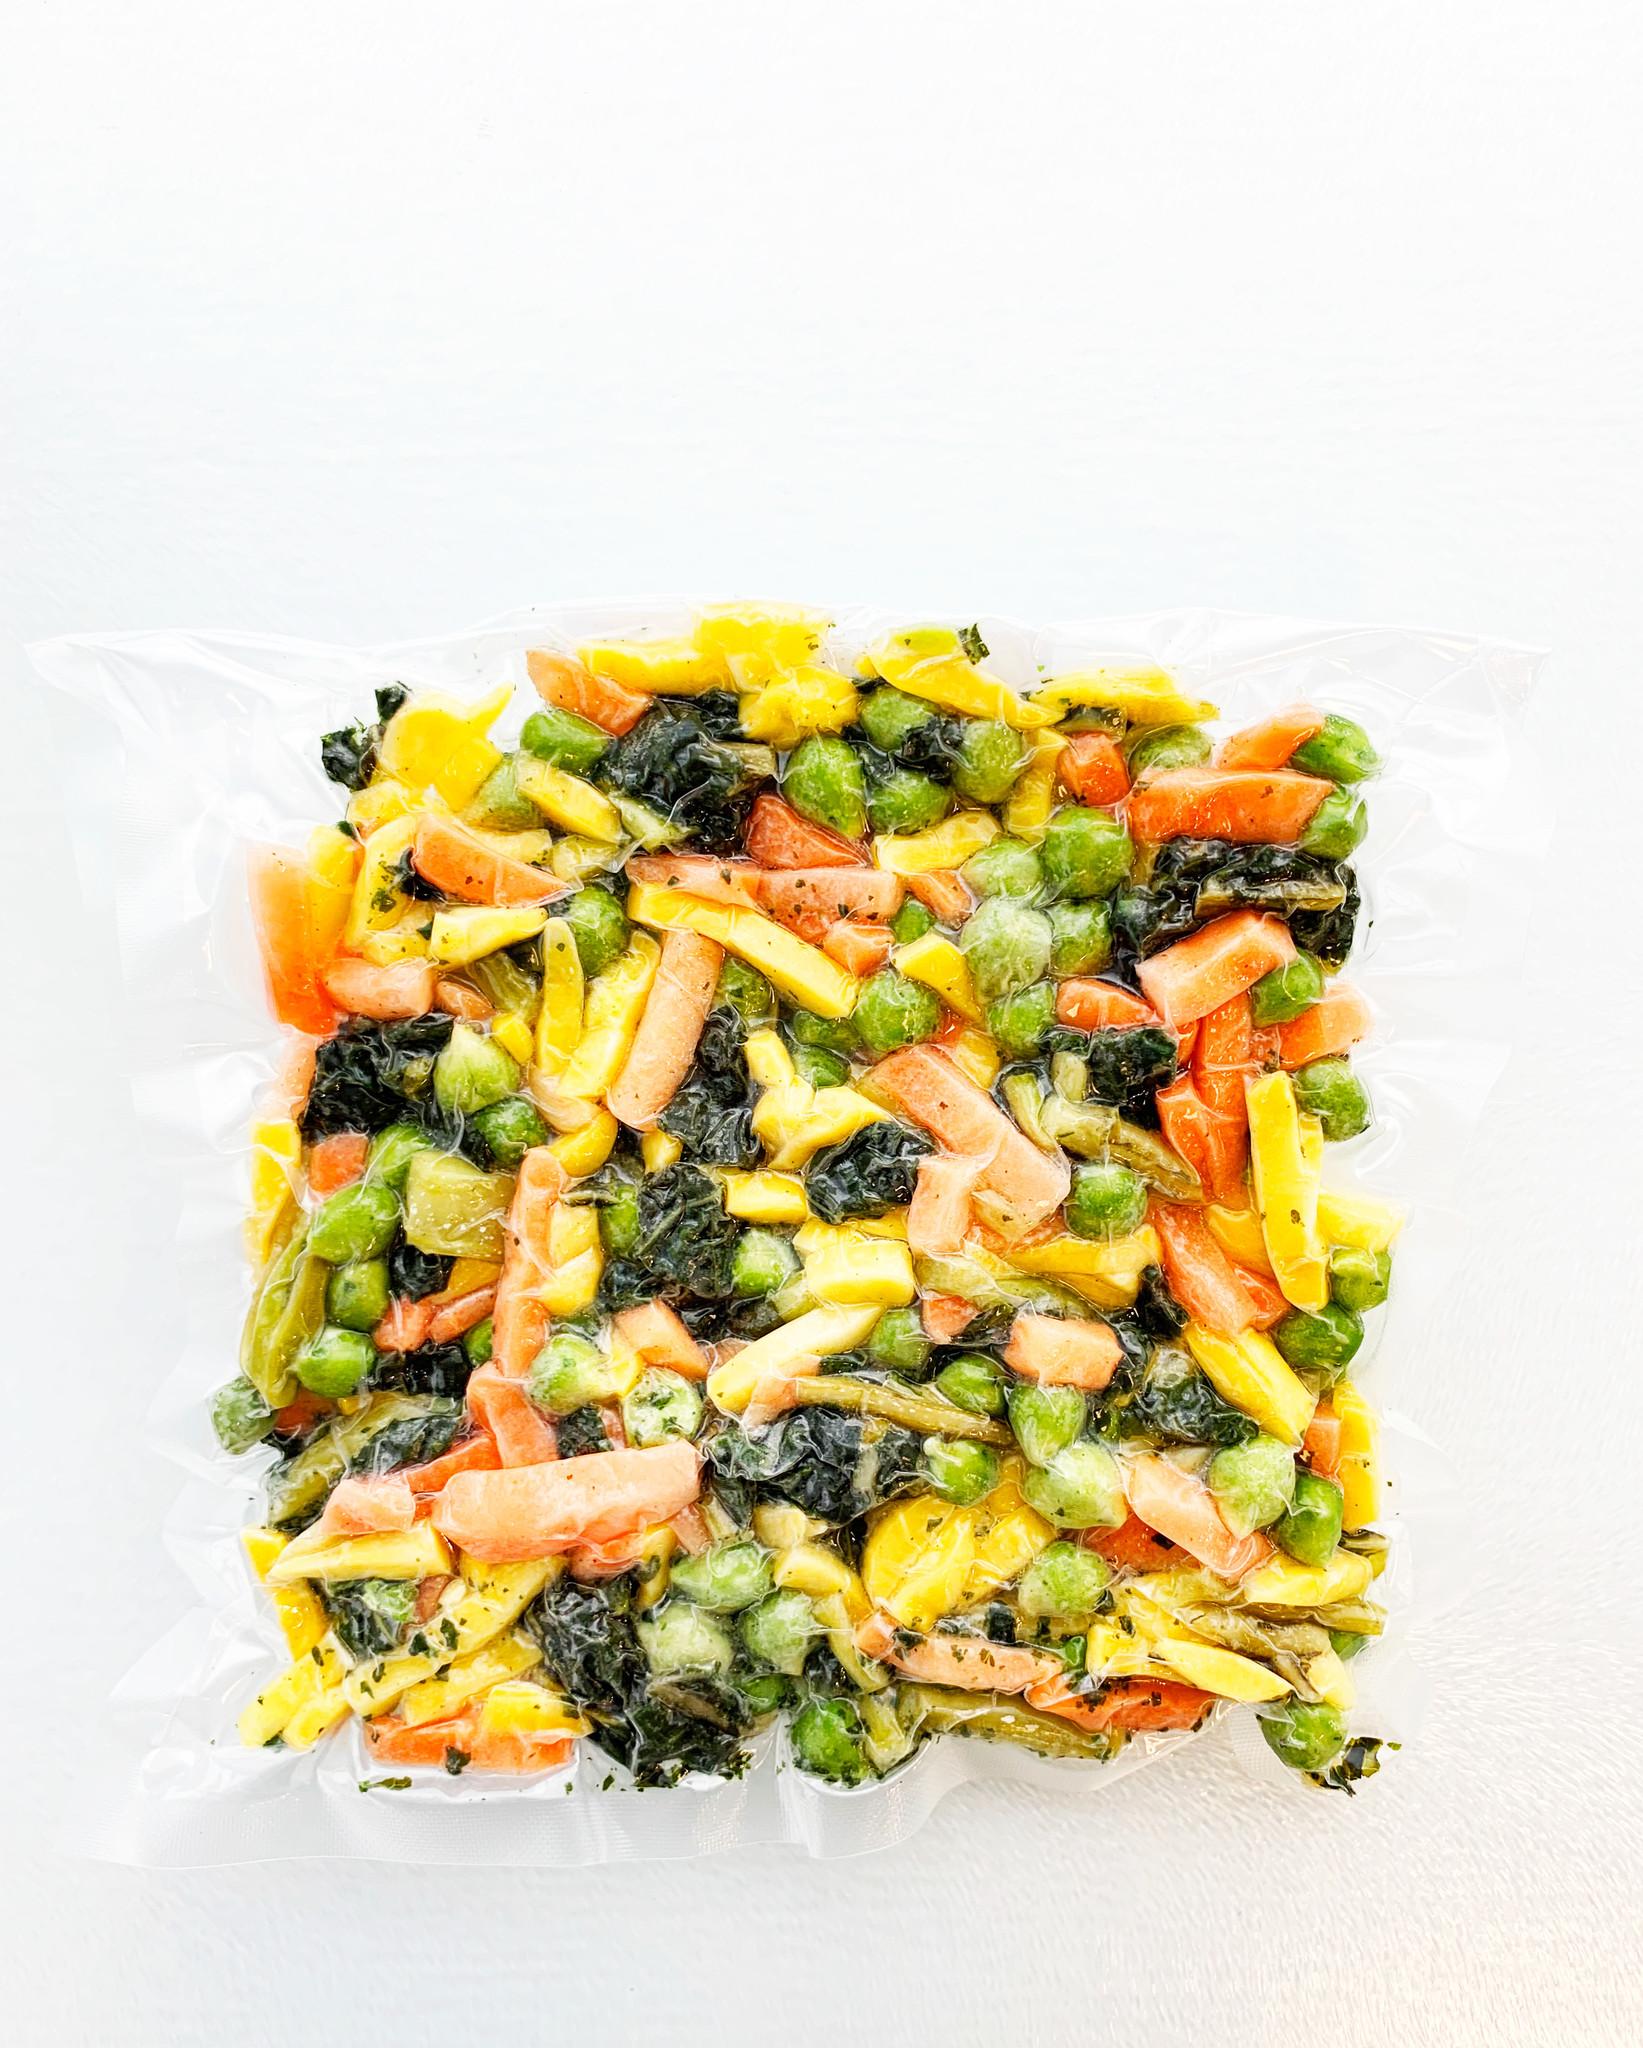 Small vegetables box